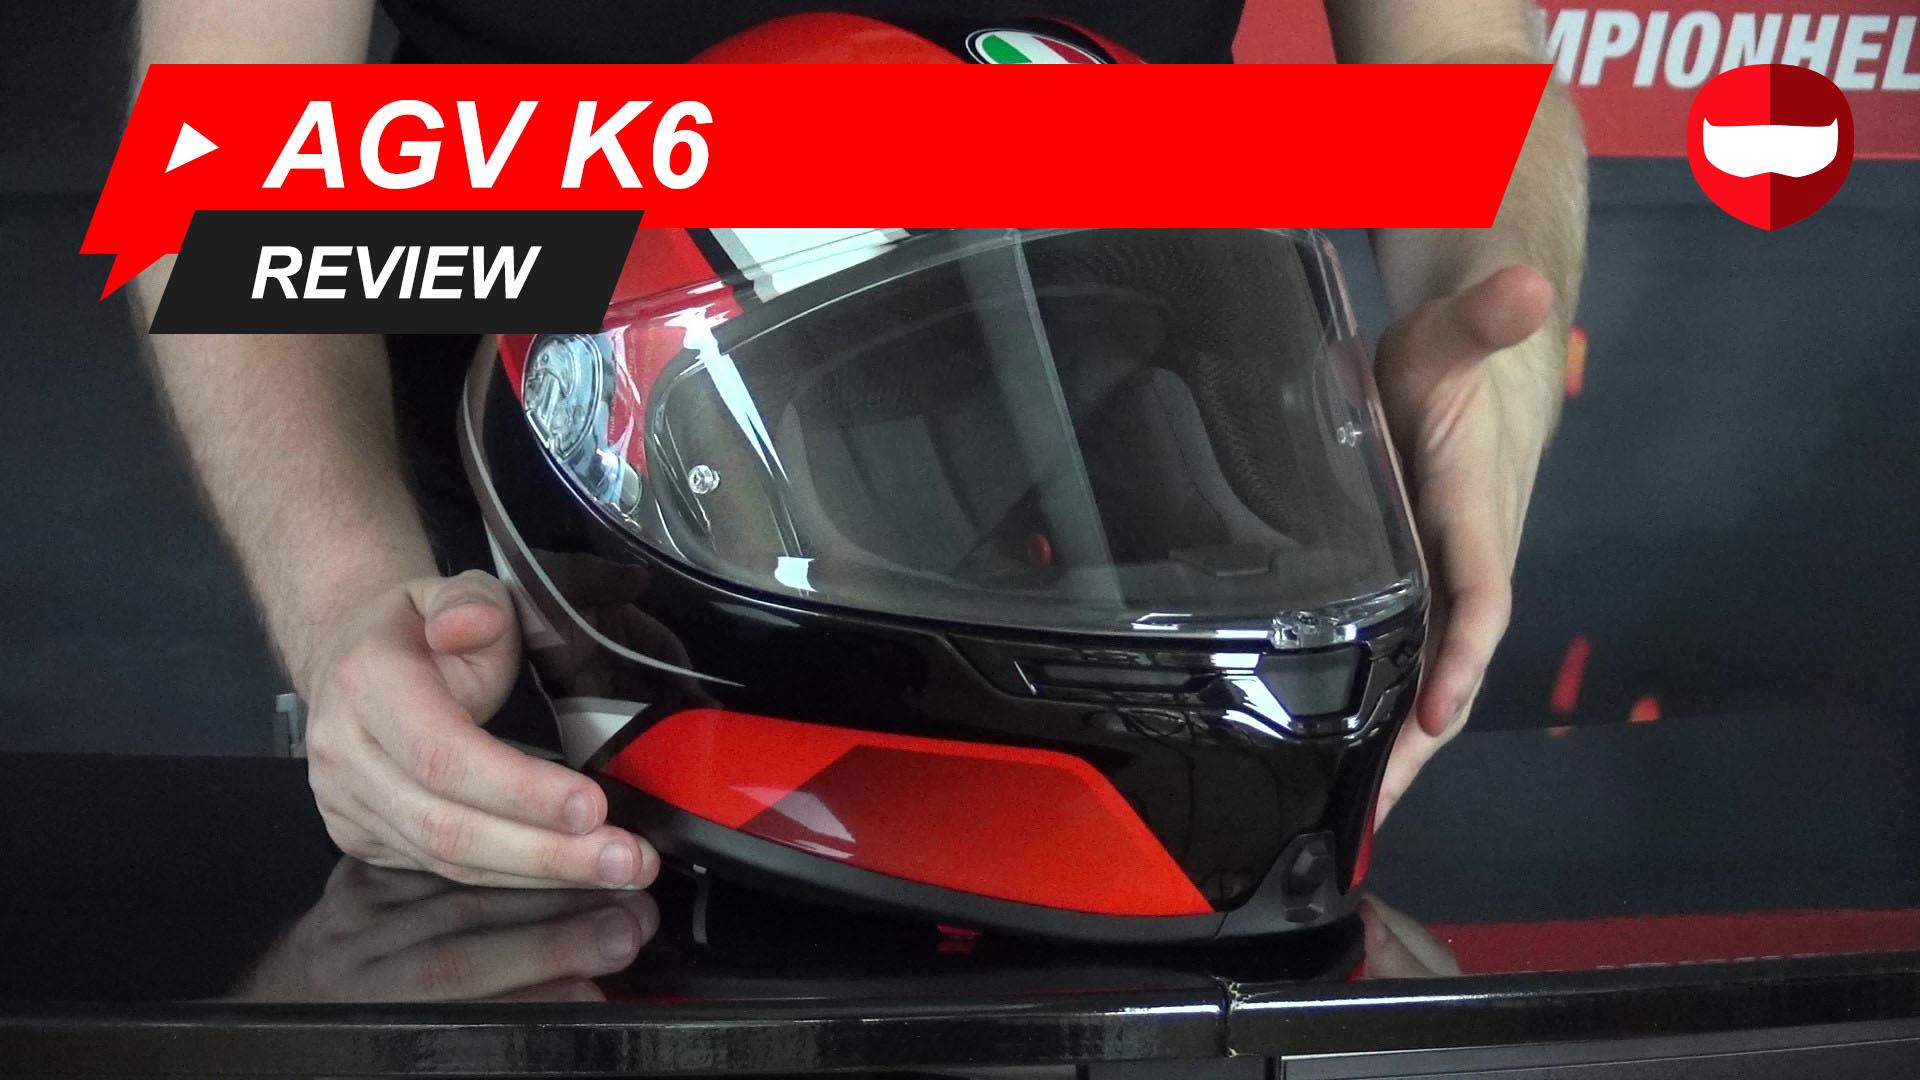 AGV K6 Integraalhelm Review